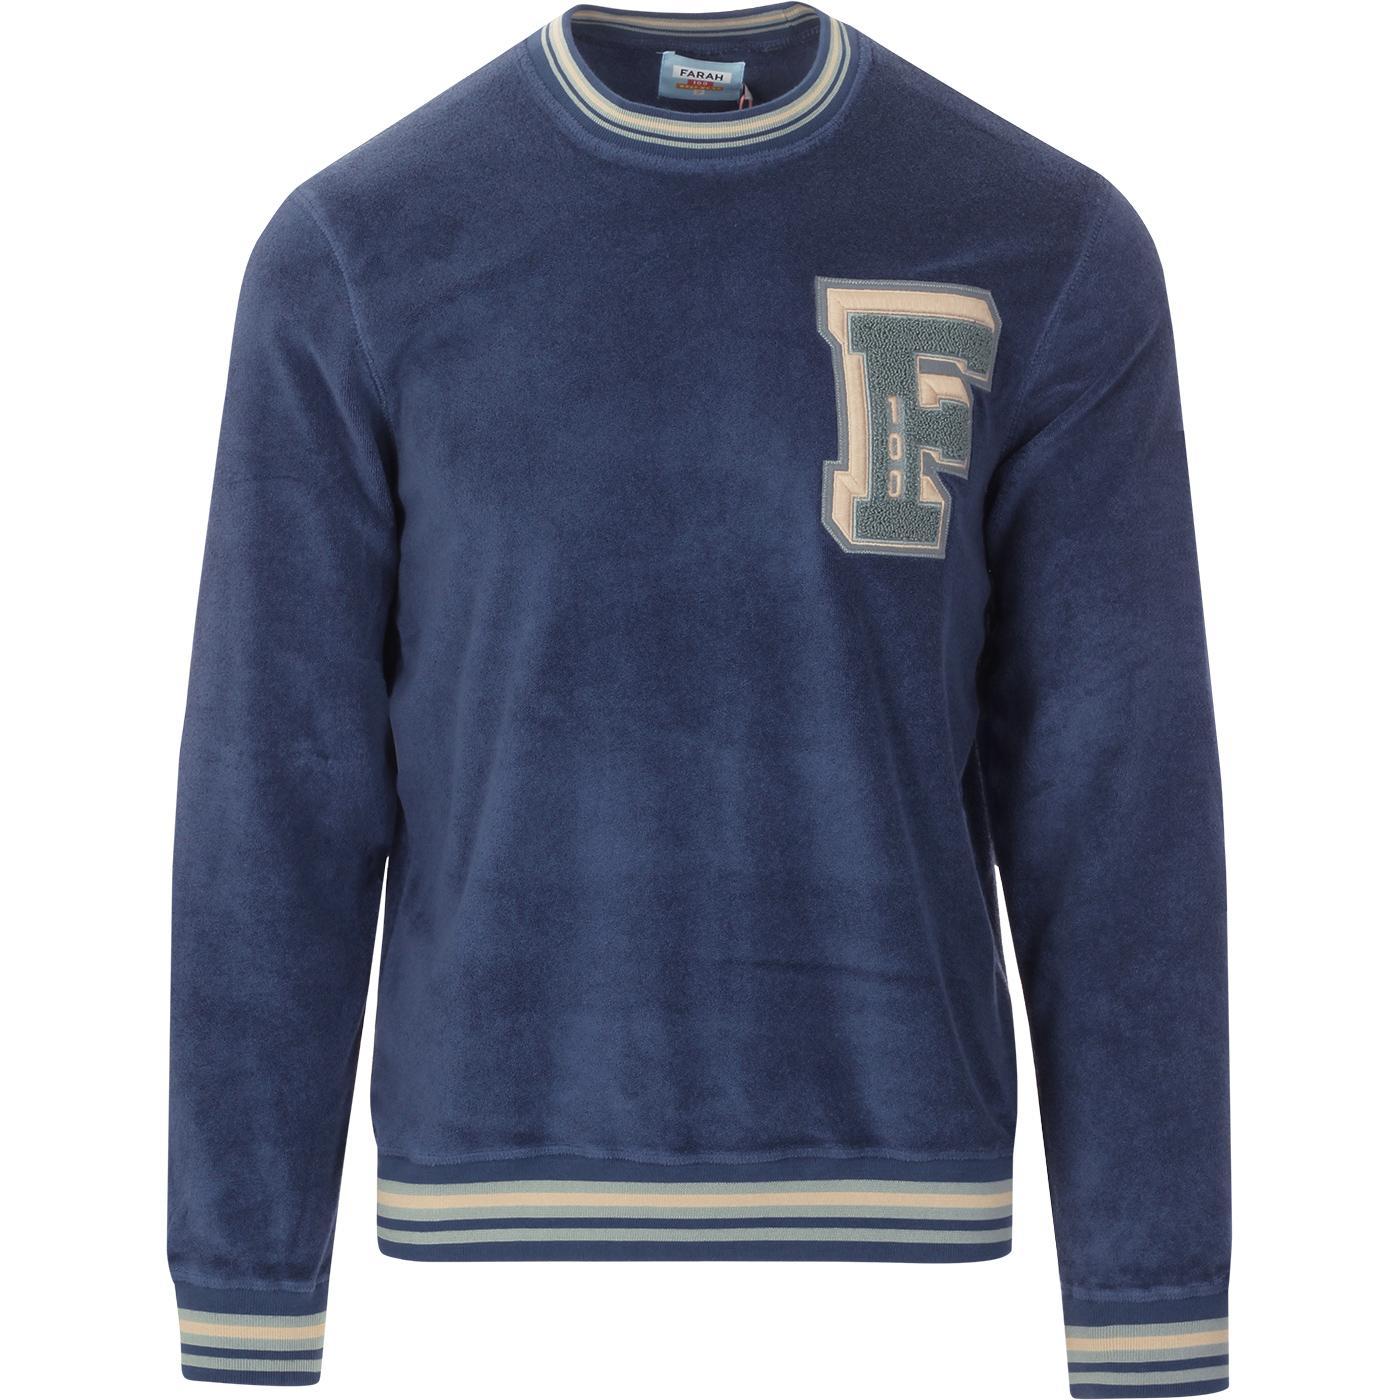 Alameda FARAH 100 Retro Towelling Sweatshirt (DB)